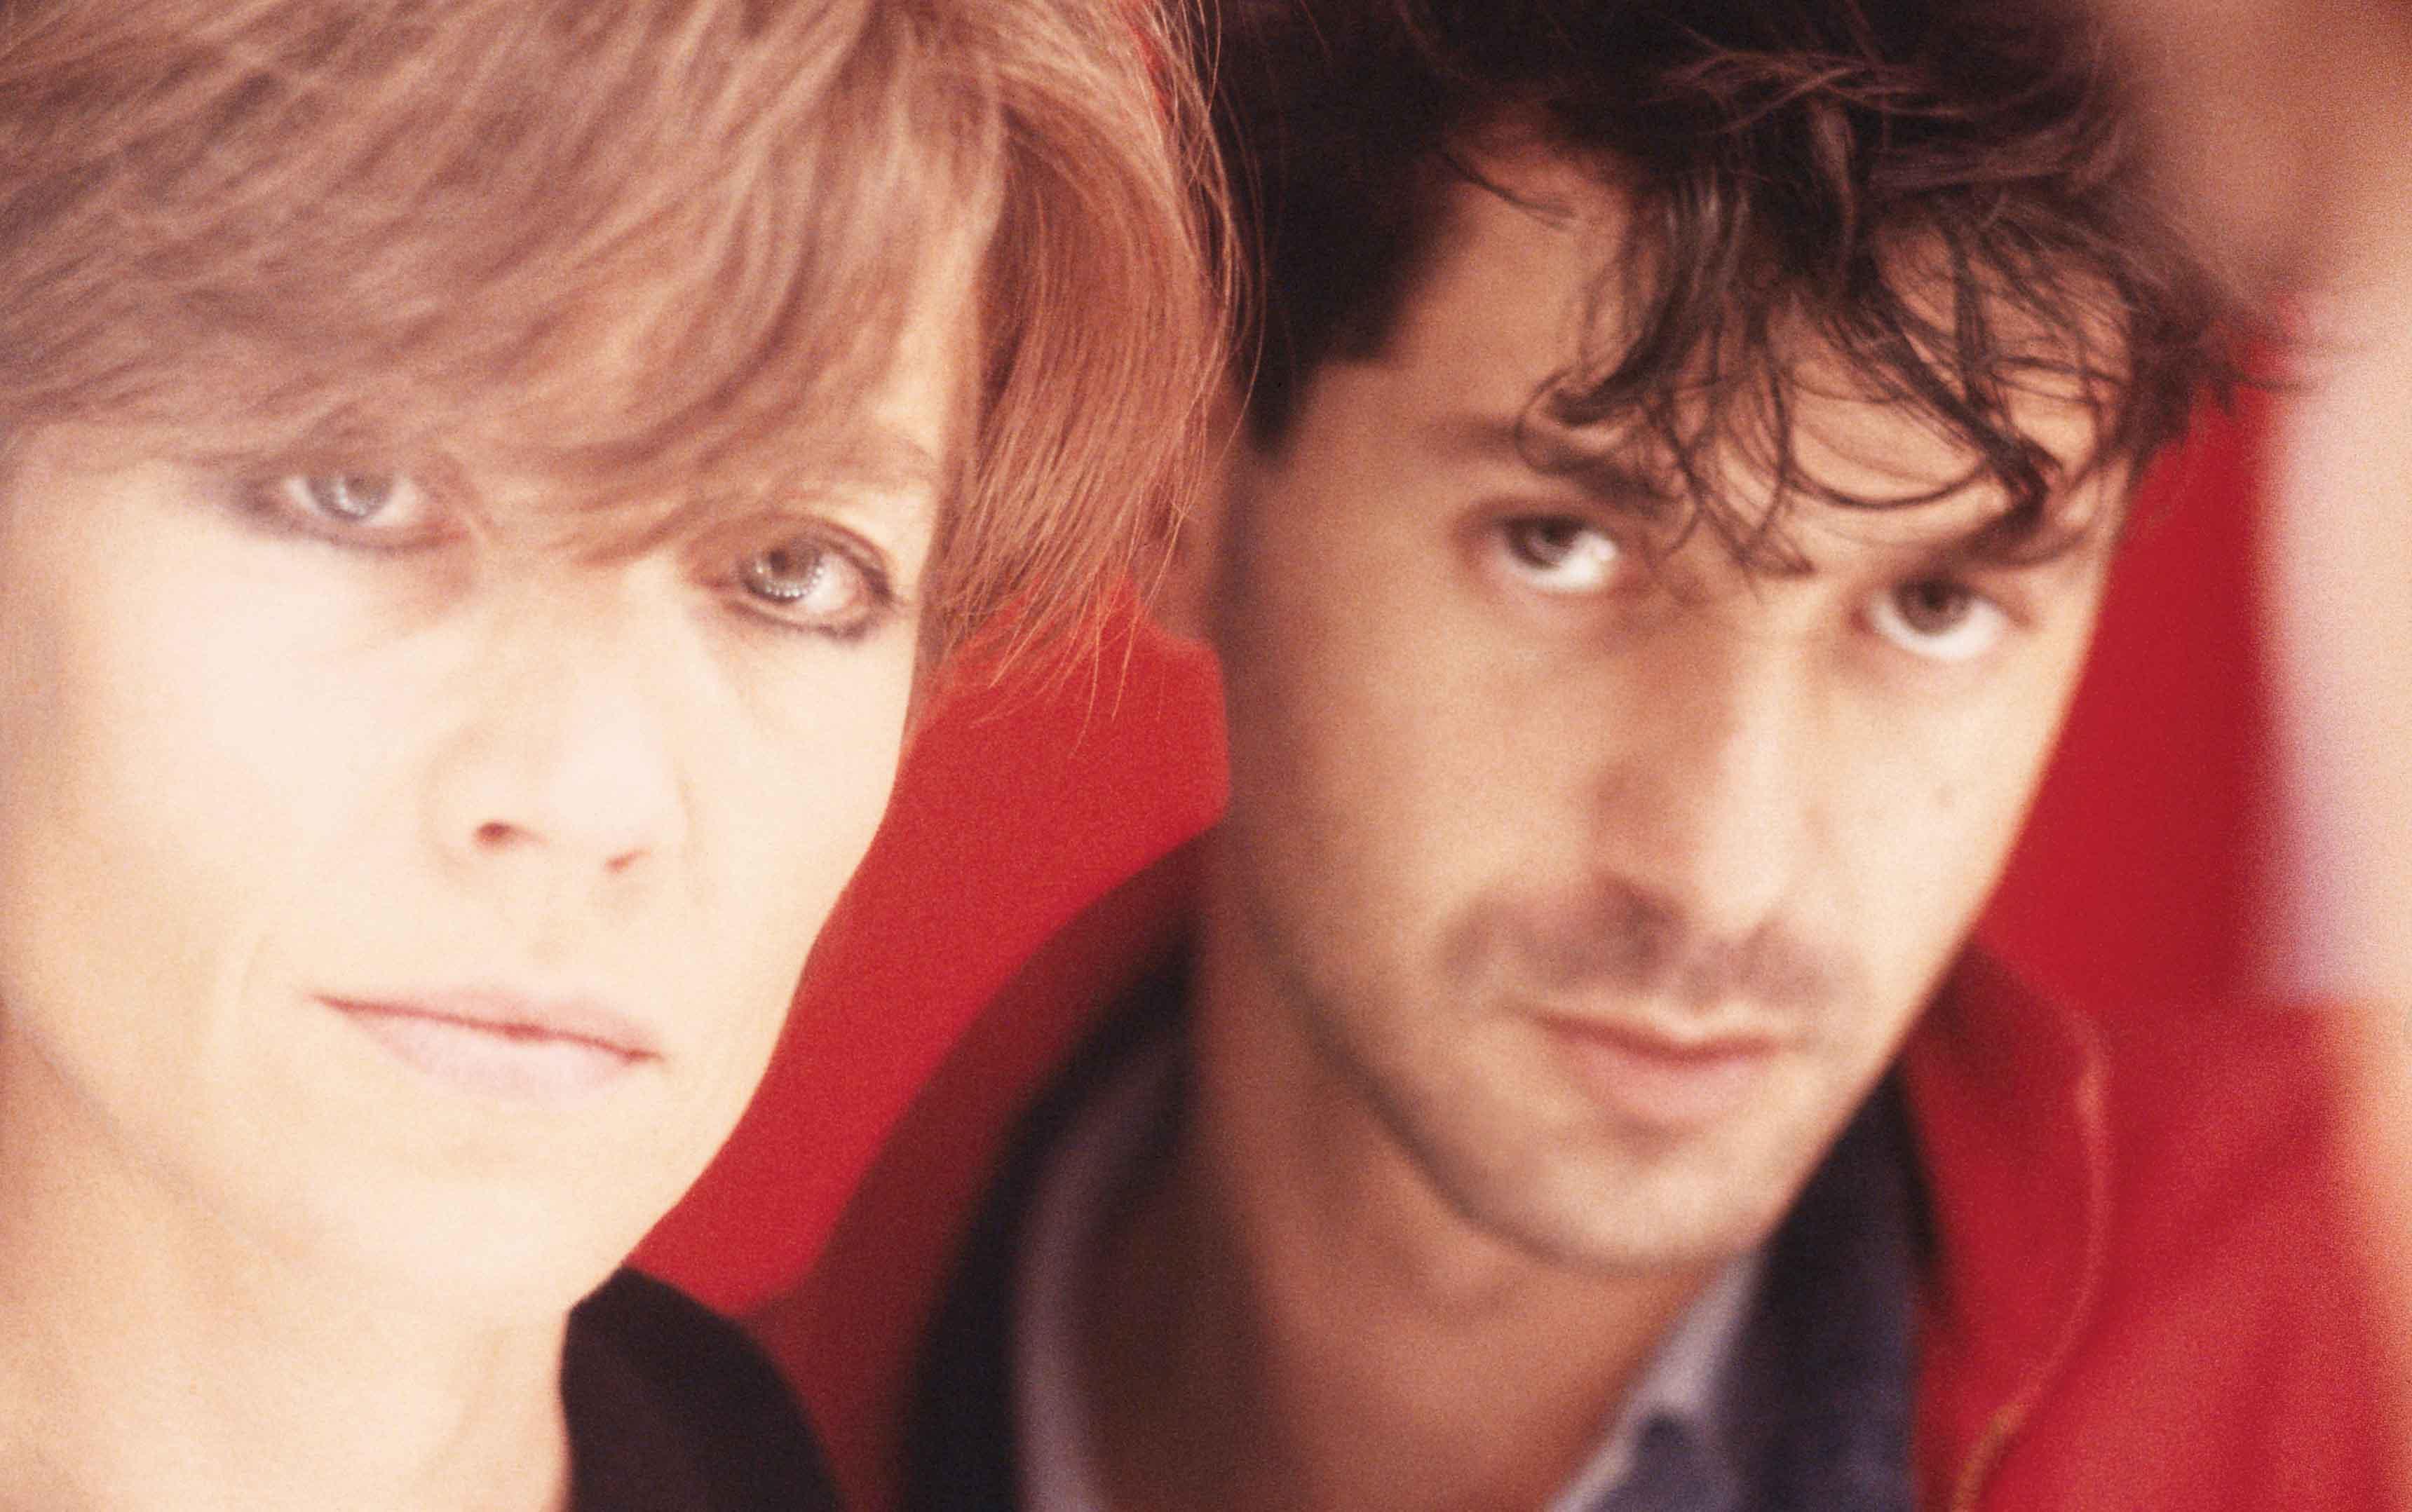 Françoise Hardy et Étienne Daho, 1985 ©Antoine Giacomoni-Mandrakimage